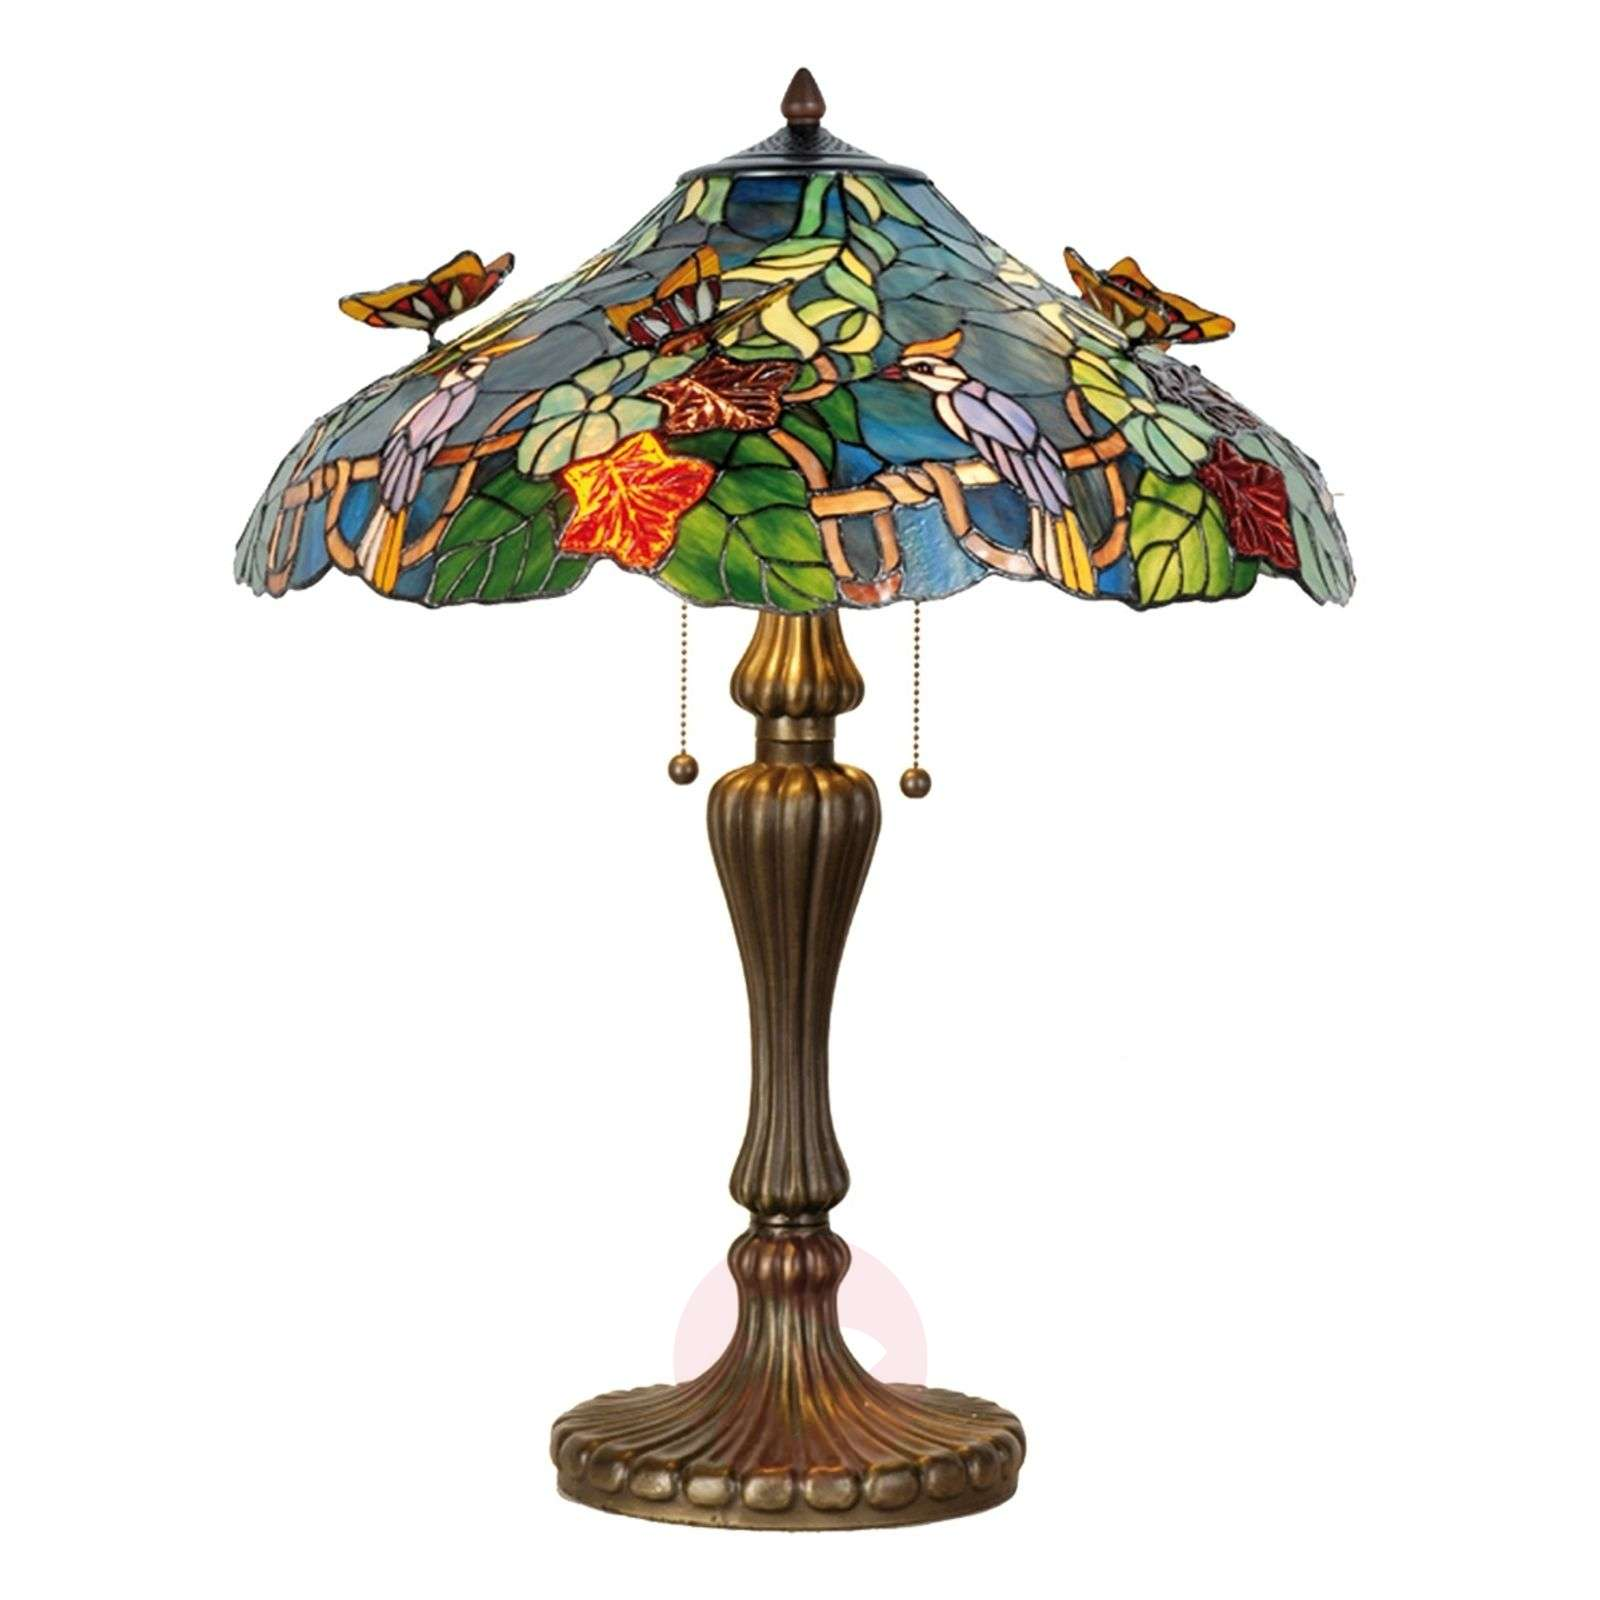 Masterful table lamp Australia, Tiffany-style-6064067-01